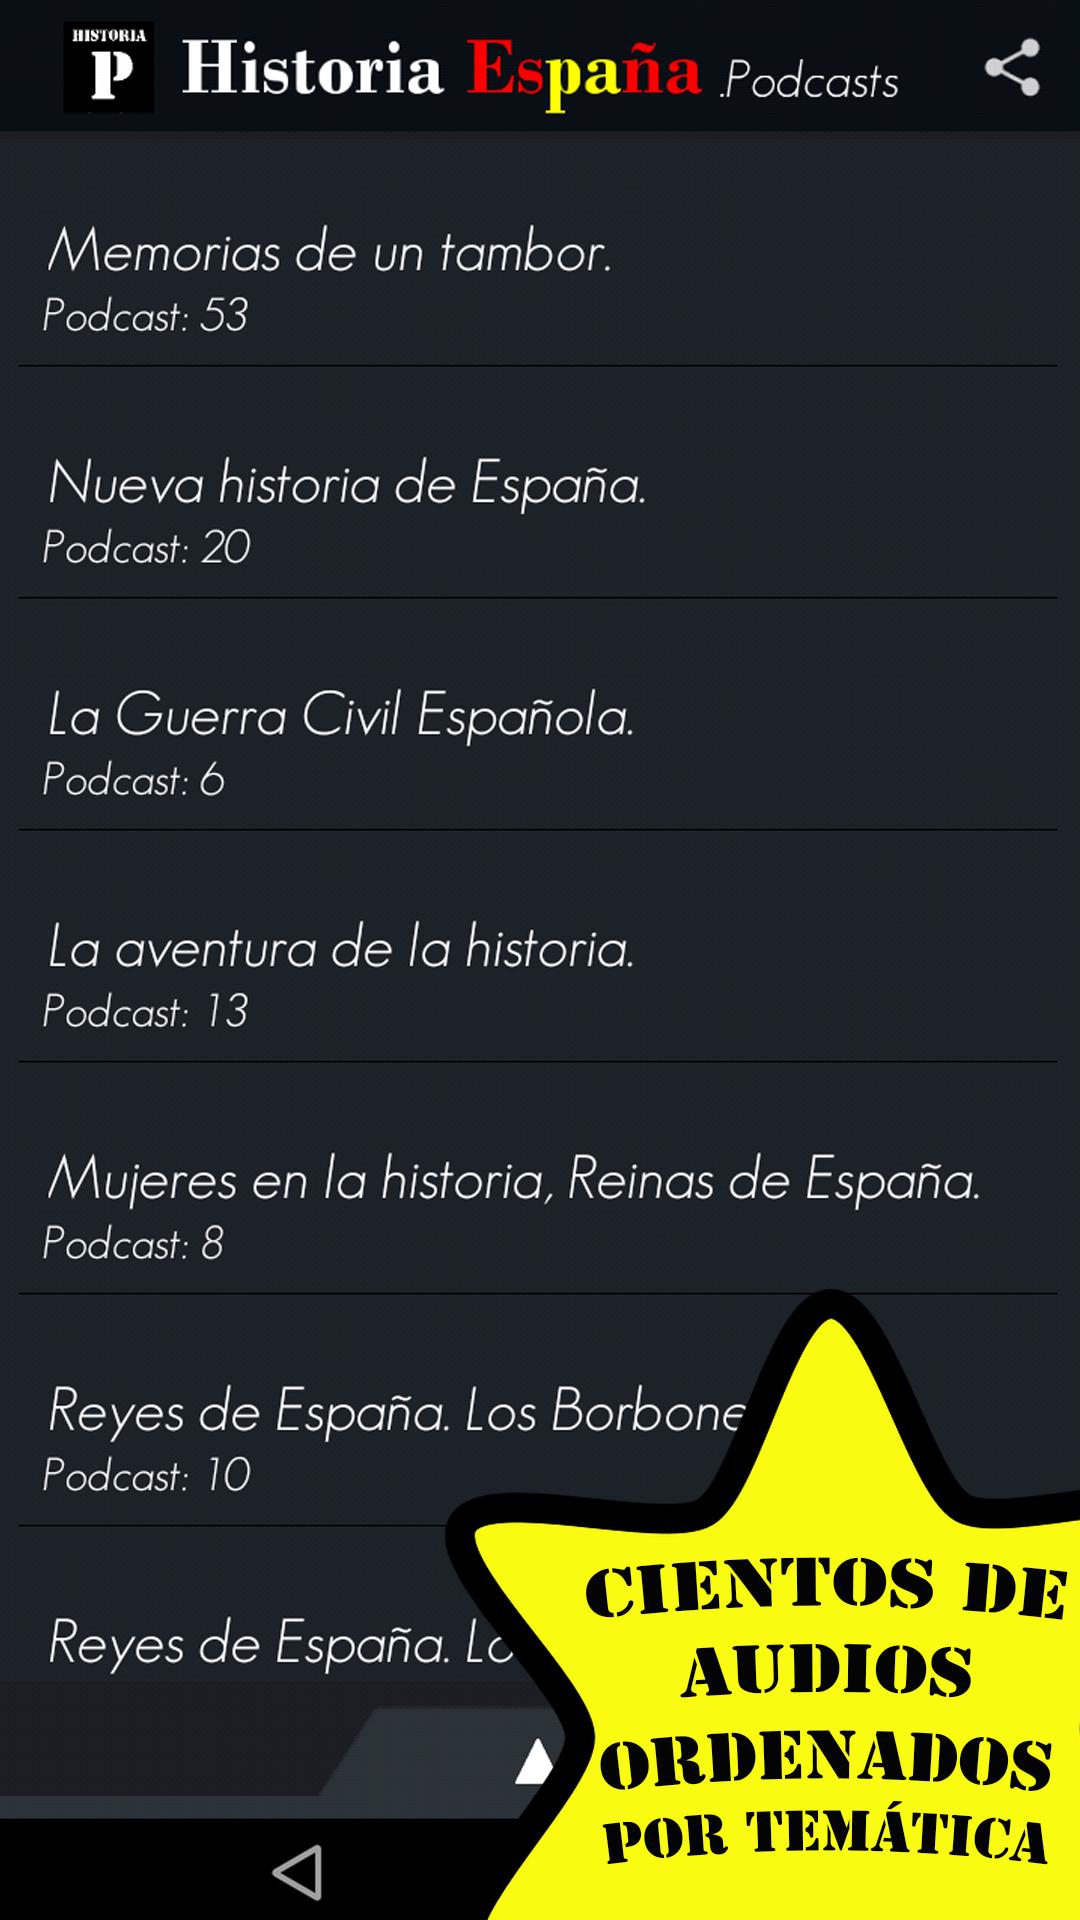 Dj santana android apps on google play.